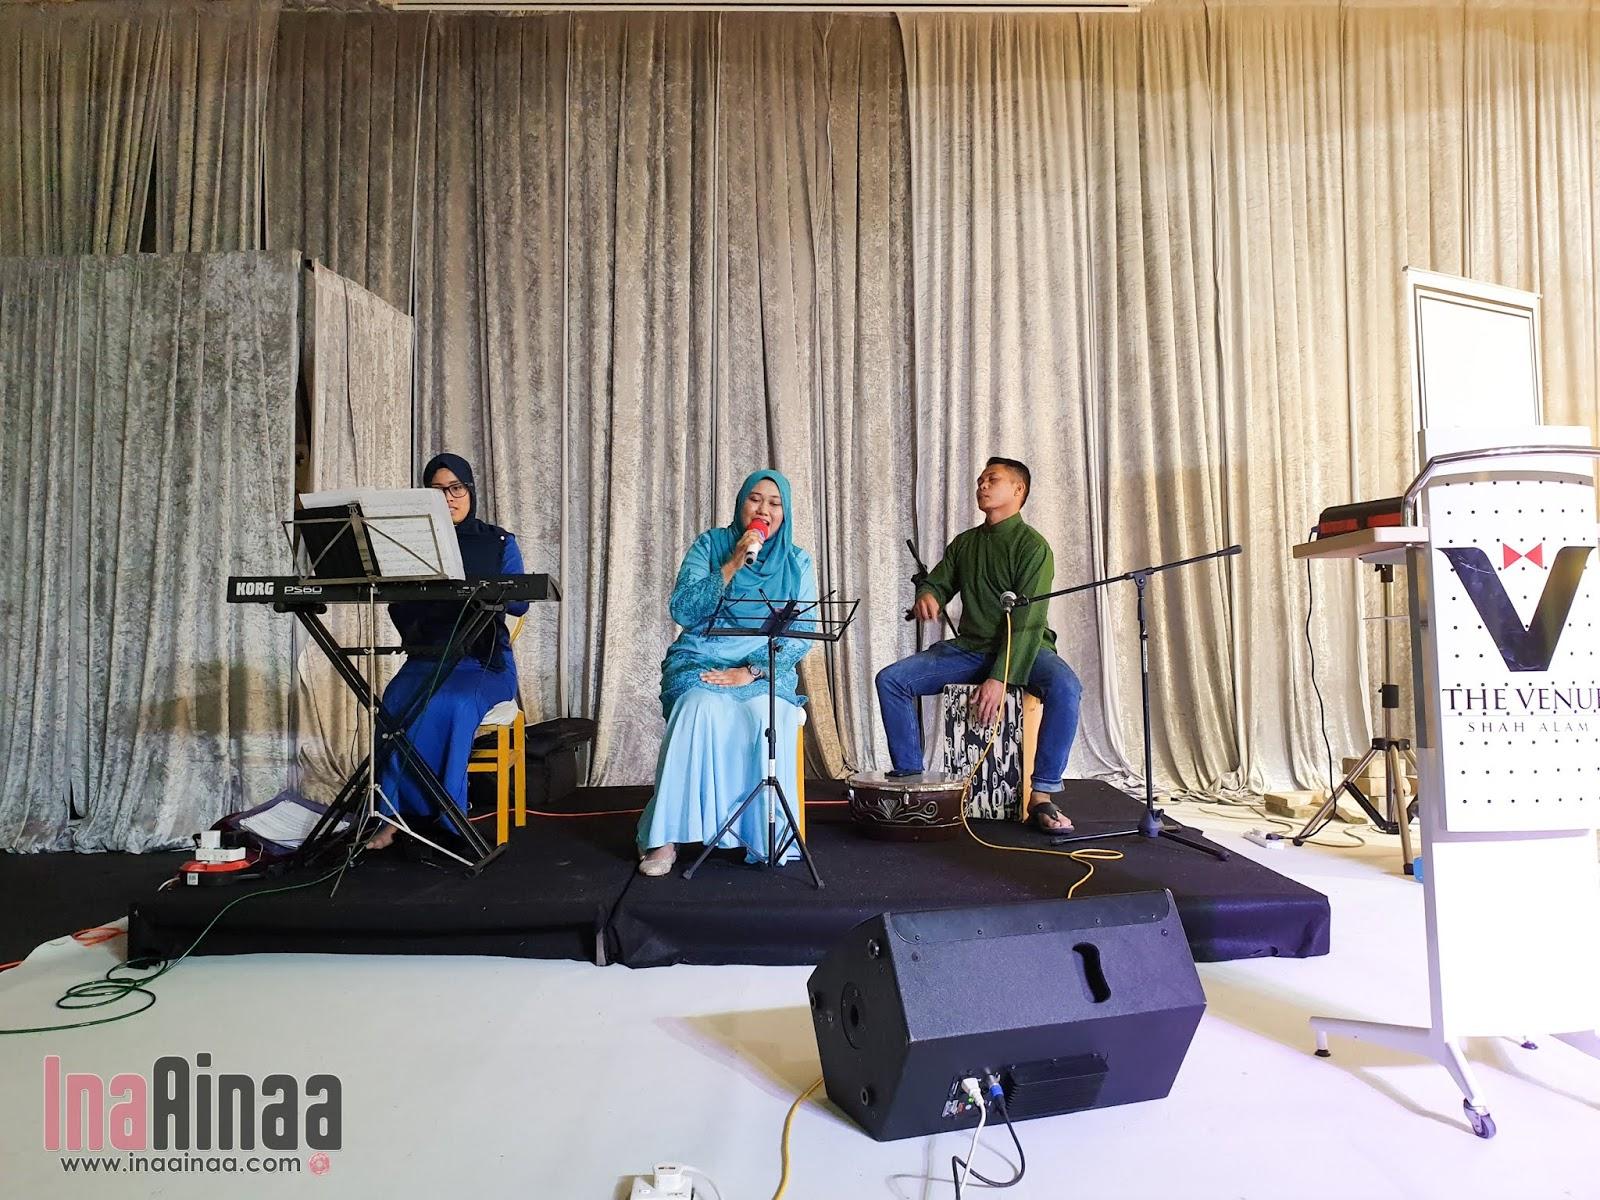 THE VENUE SHAH ALAM- Hak Milik Ina Ainaa